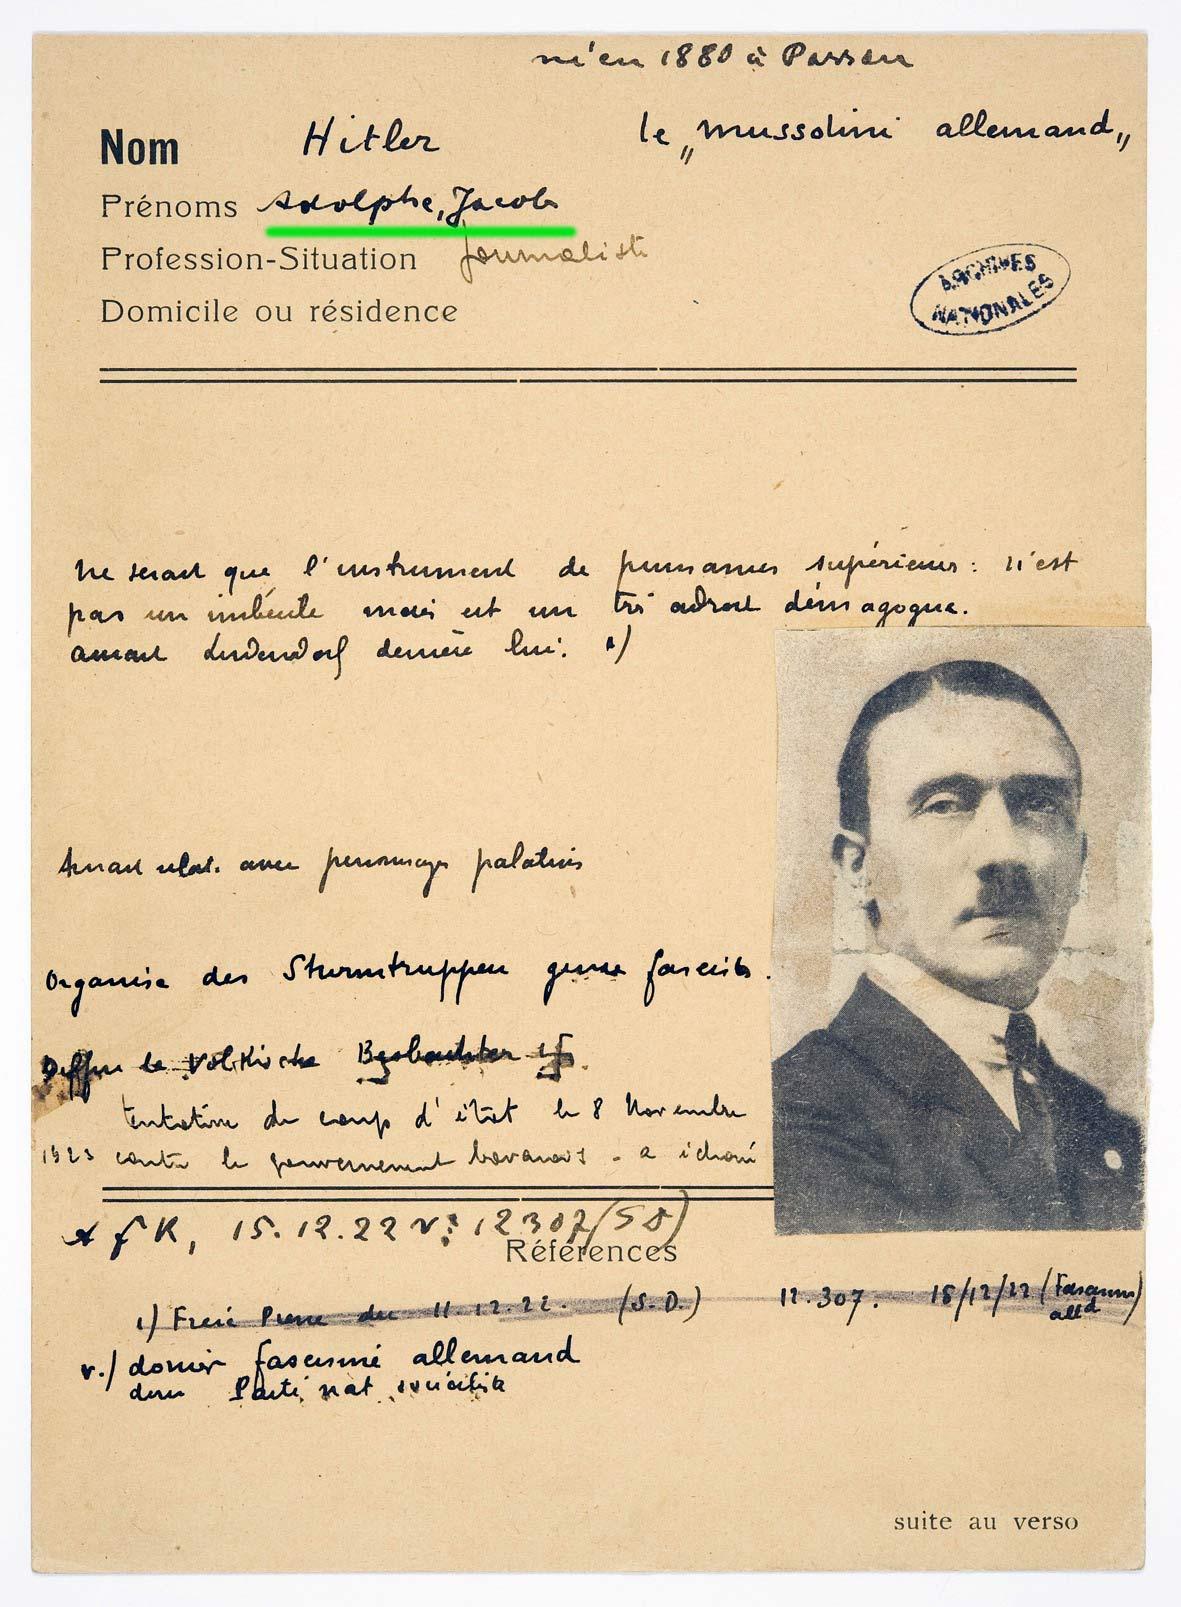 adolf-hitler-jacob-juif Incroyable mais vrai : Adolf Hitler était ... JUIF !